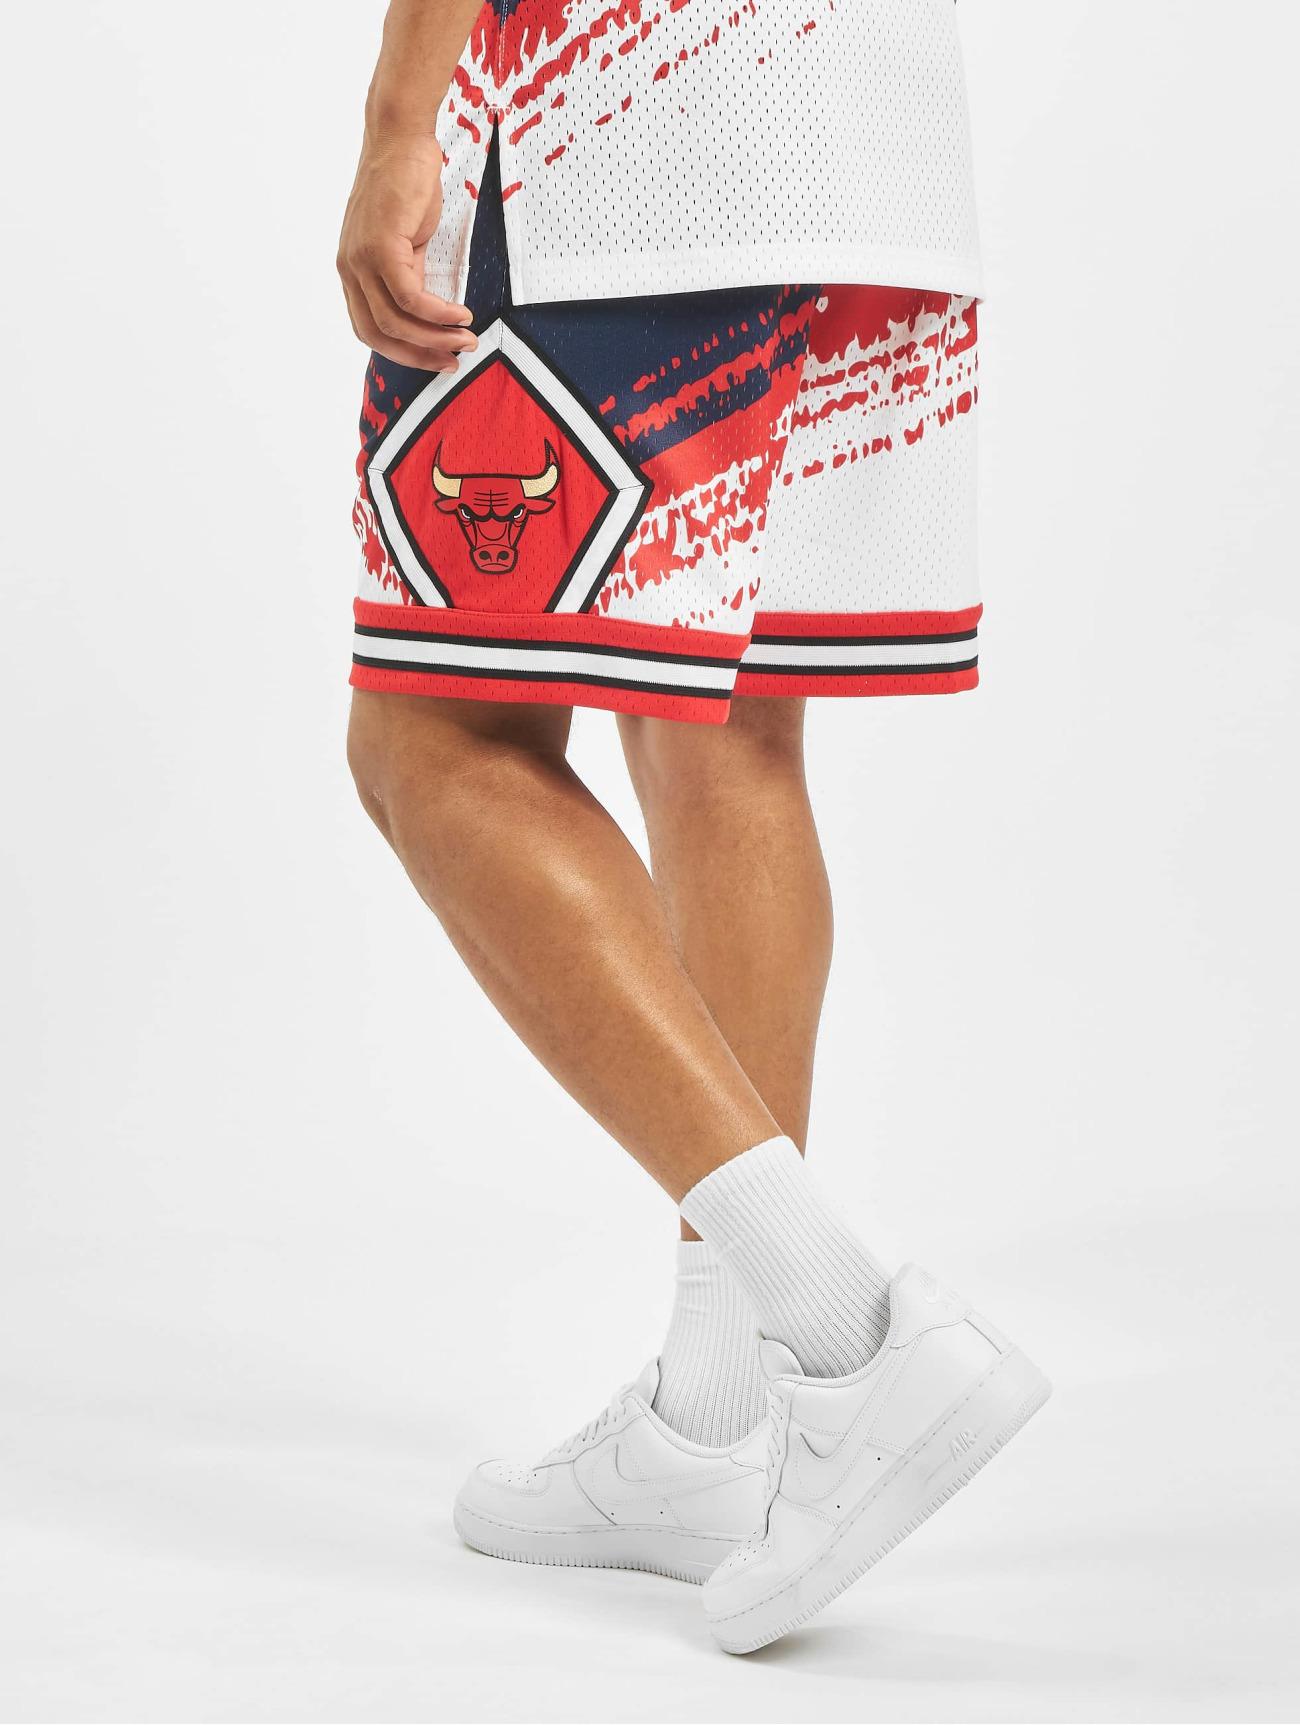 Mitchell & Ness Byxor / Shorts Independence Swingman Chicago Bulls  i blå 709300 Män Byxor